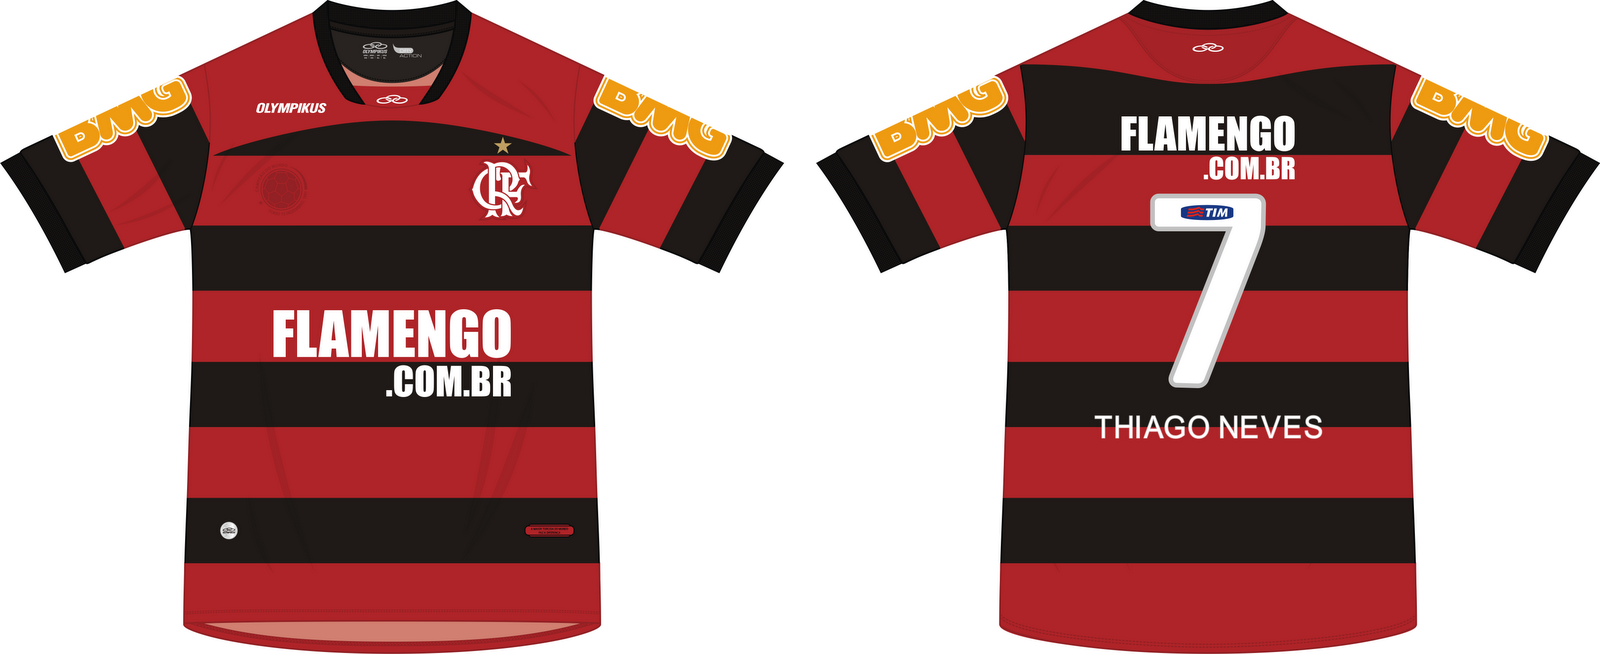 aee6c6e742 Manto Rubro-Negro  Flamengo + TIM